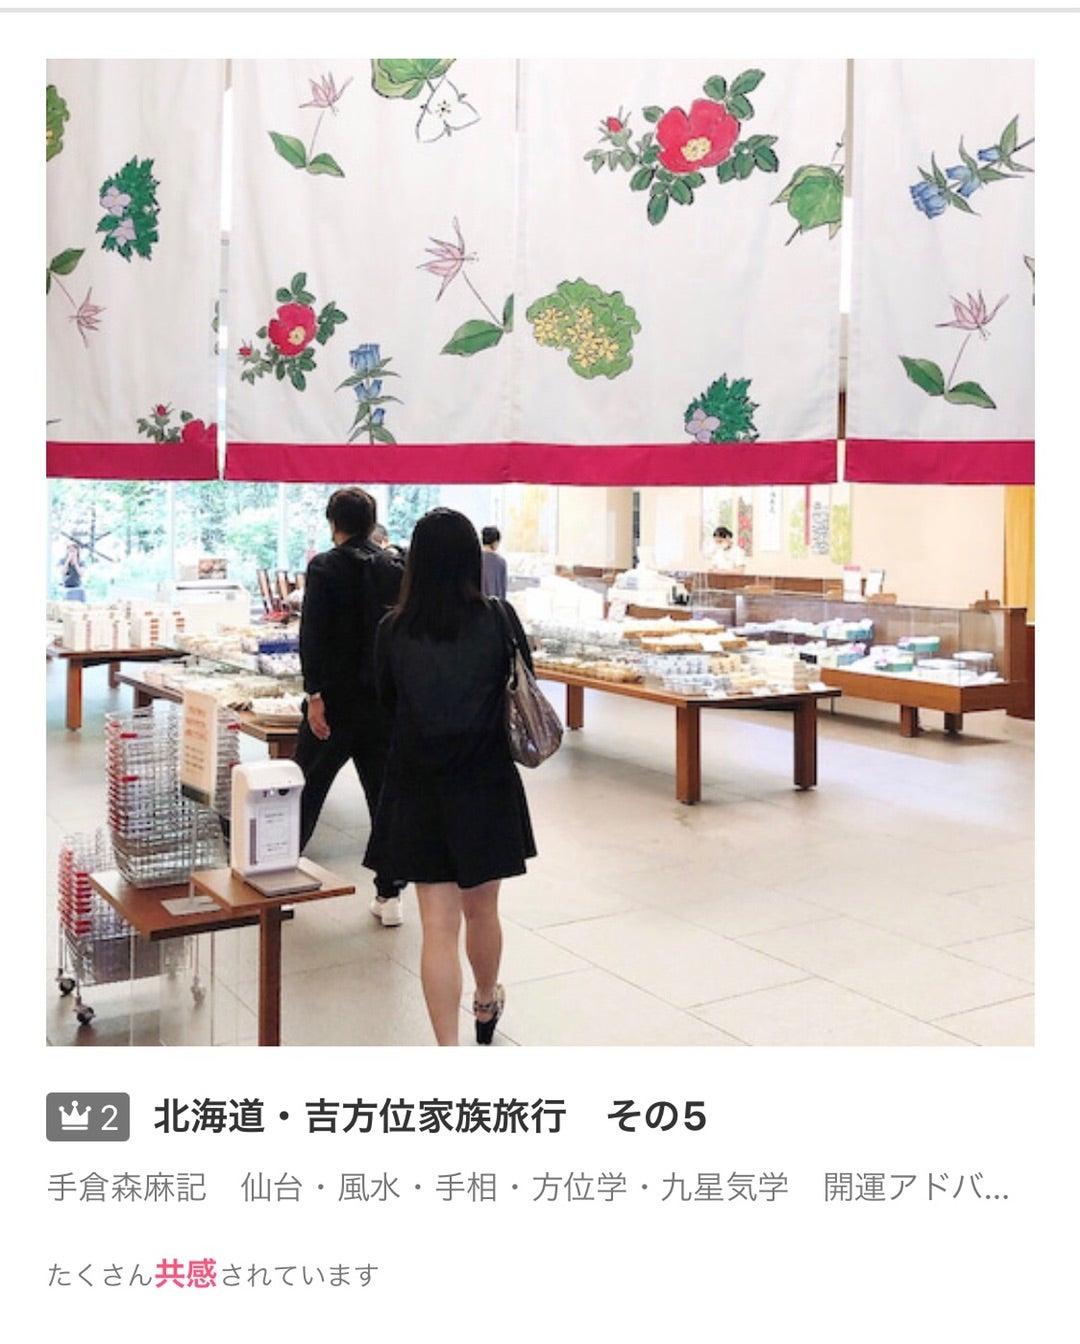 北海道・吉方位家族旅行 その6 『空港内の天然温泉』